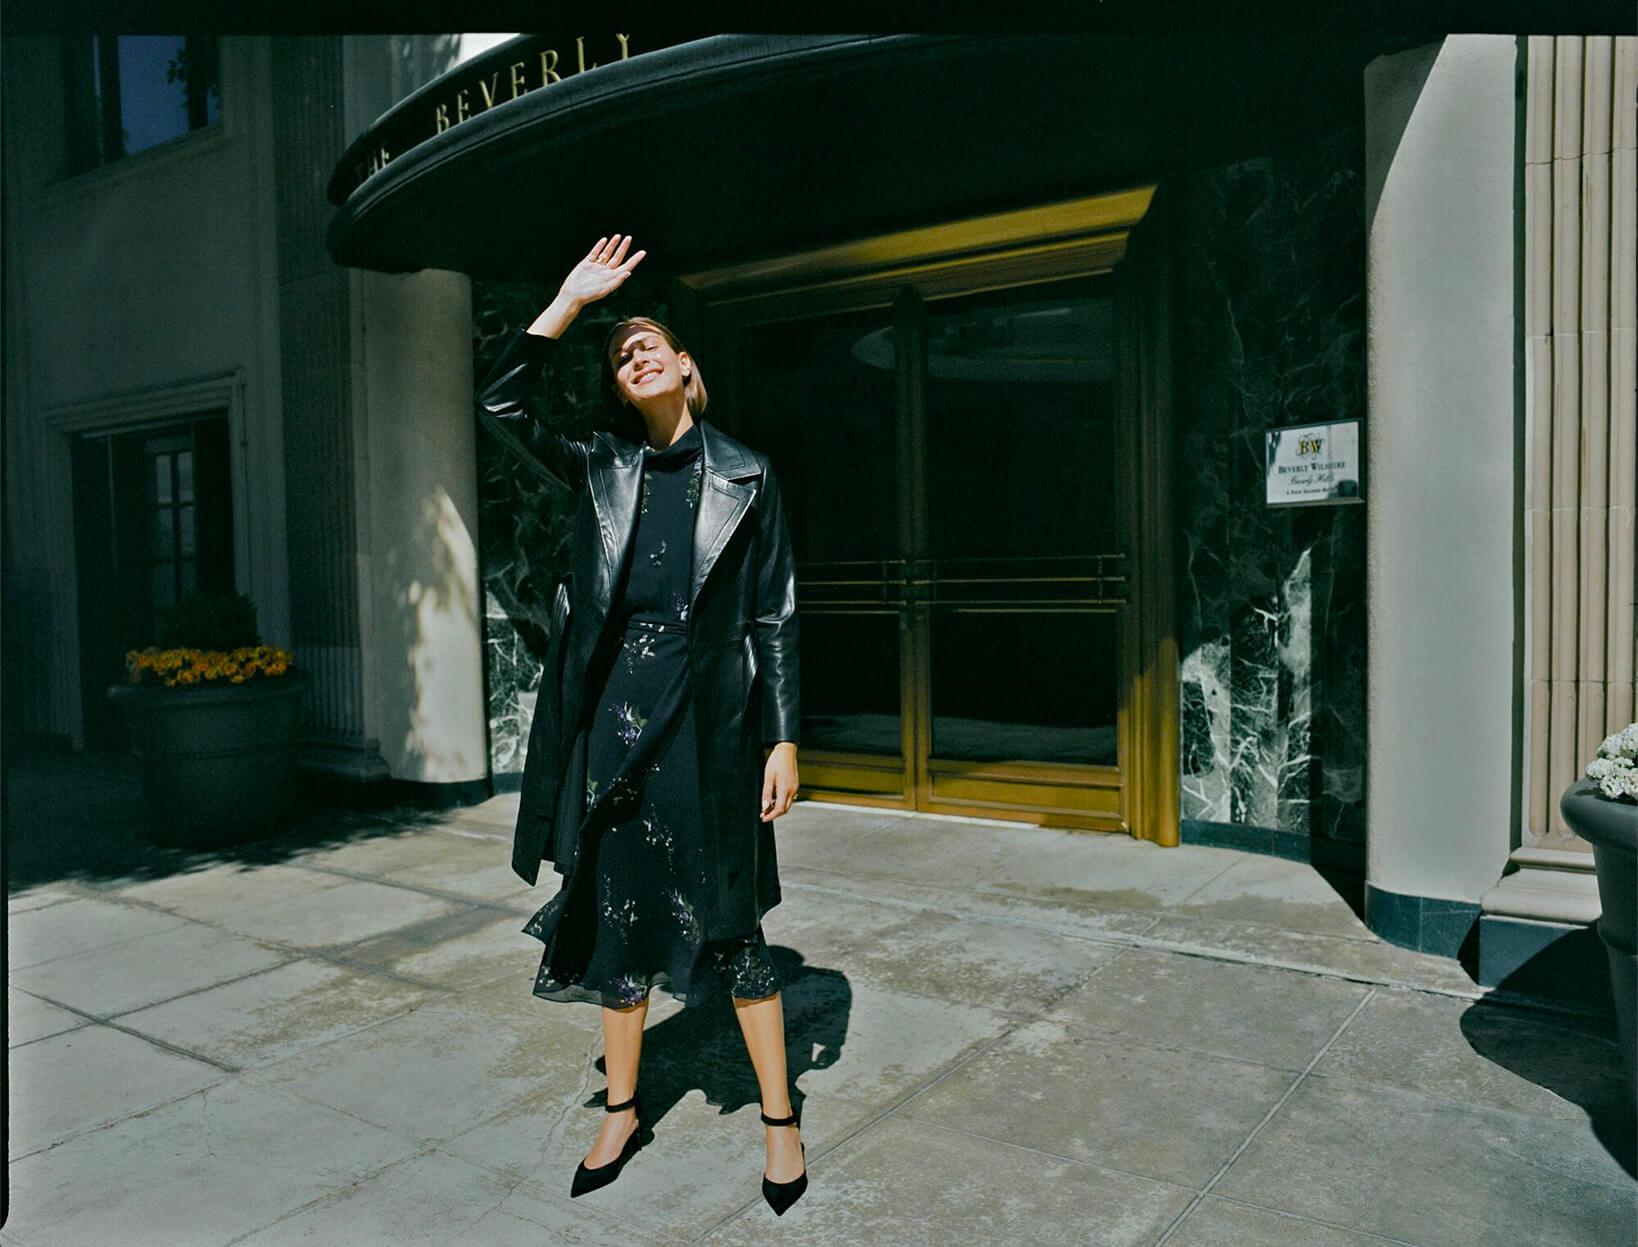 G. Label Mari High-Neck Flutter-Sleeve Mid-Length Dress & AGL Pumps